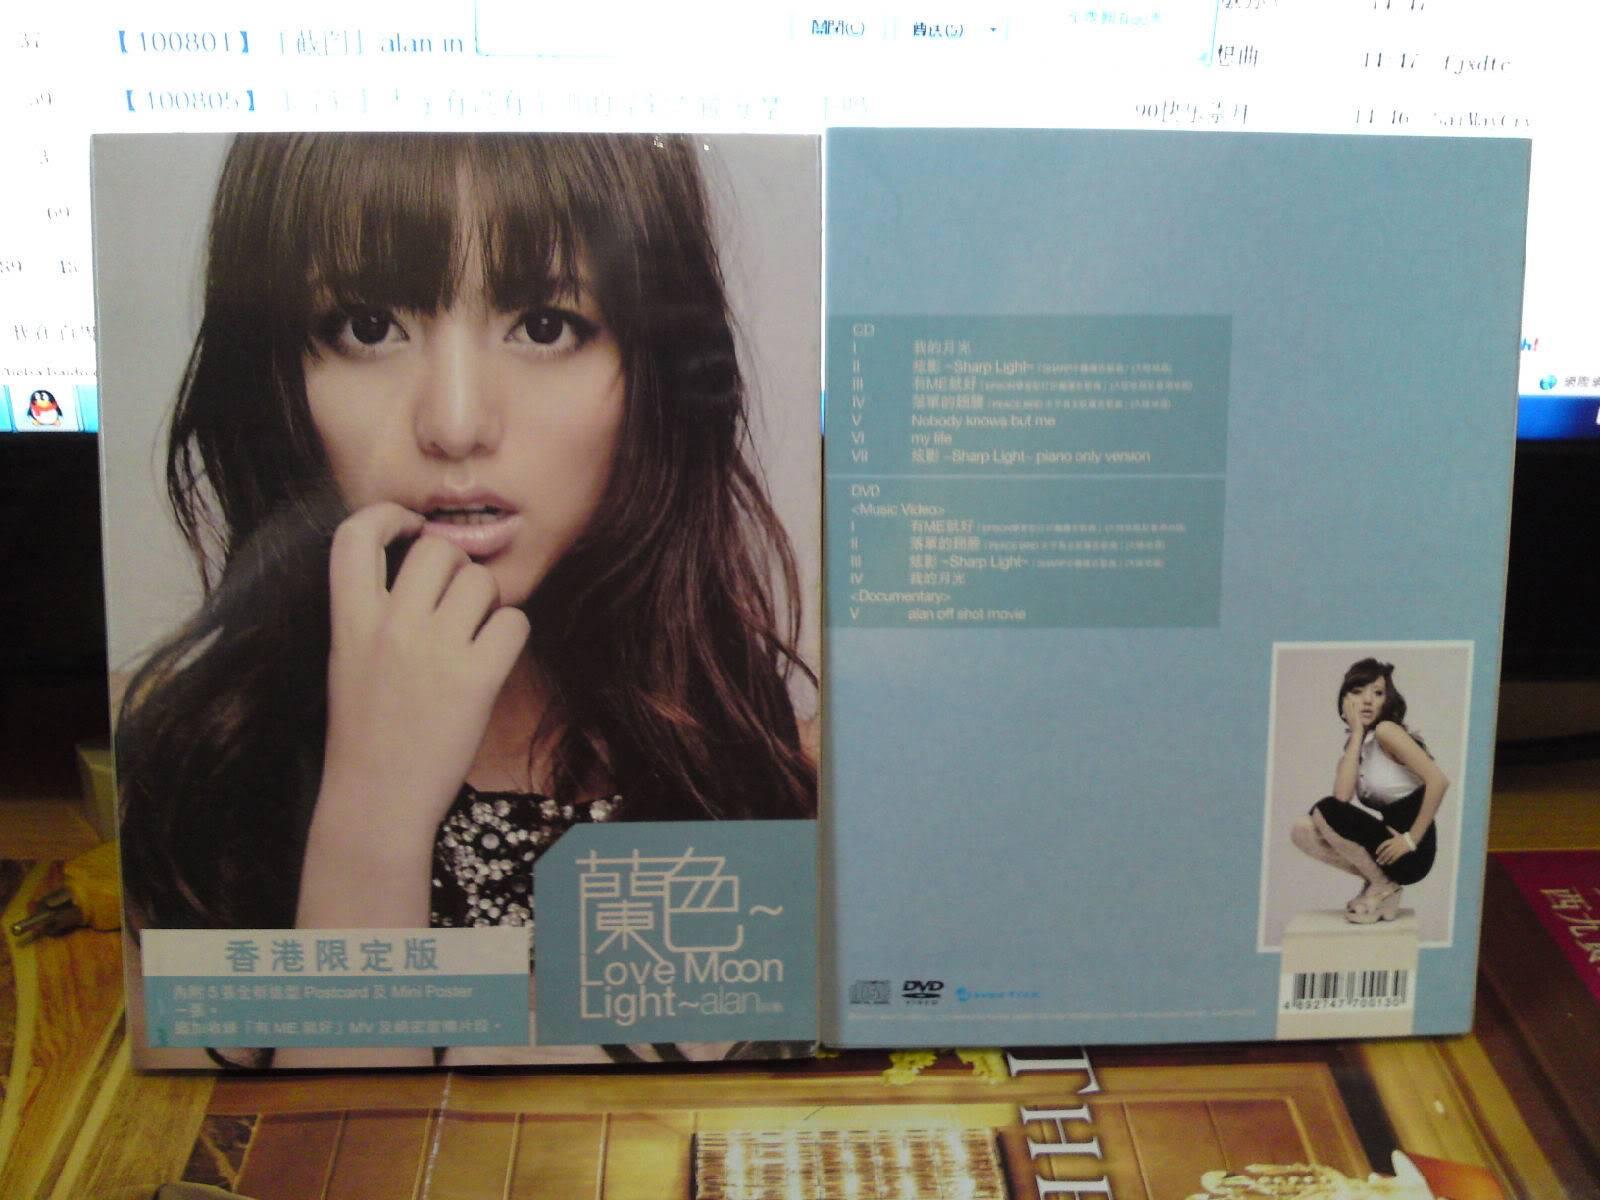 [Official] New Mandarin EP: 蘭色~Love Moon Light~ - Page 8 7e9d475bfaf2349c9e820470